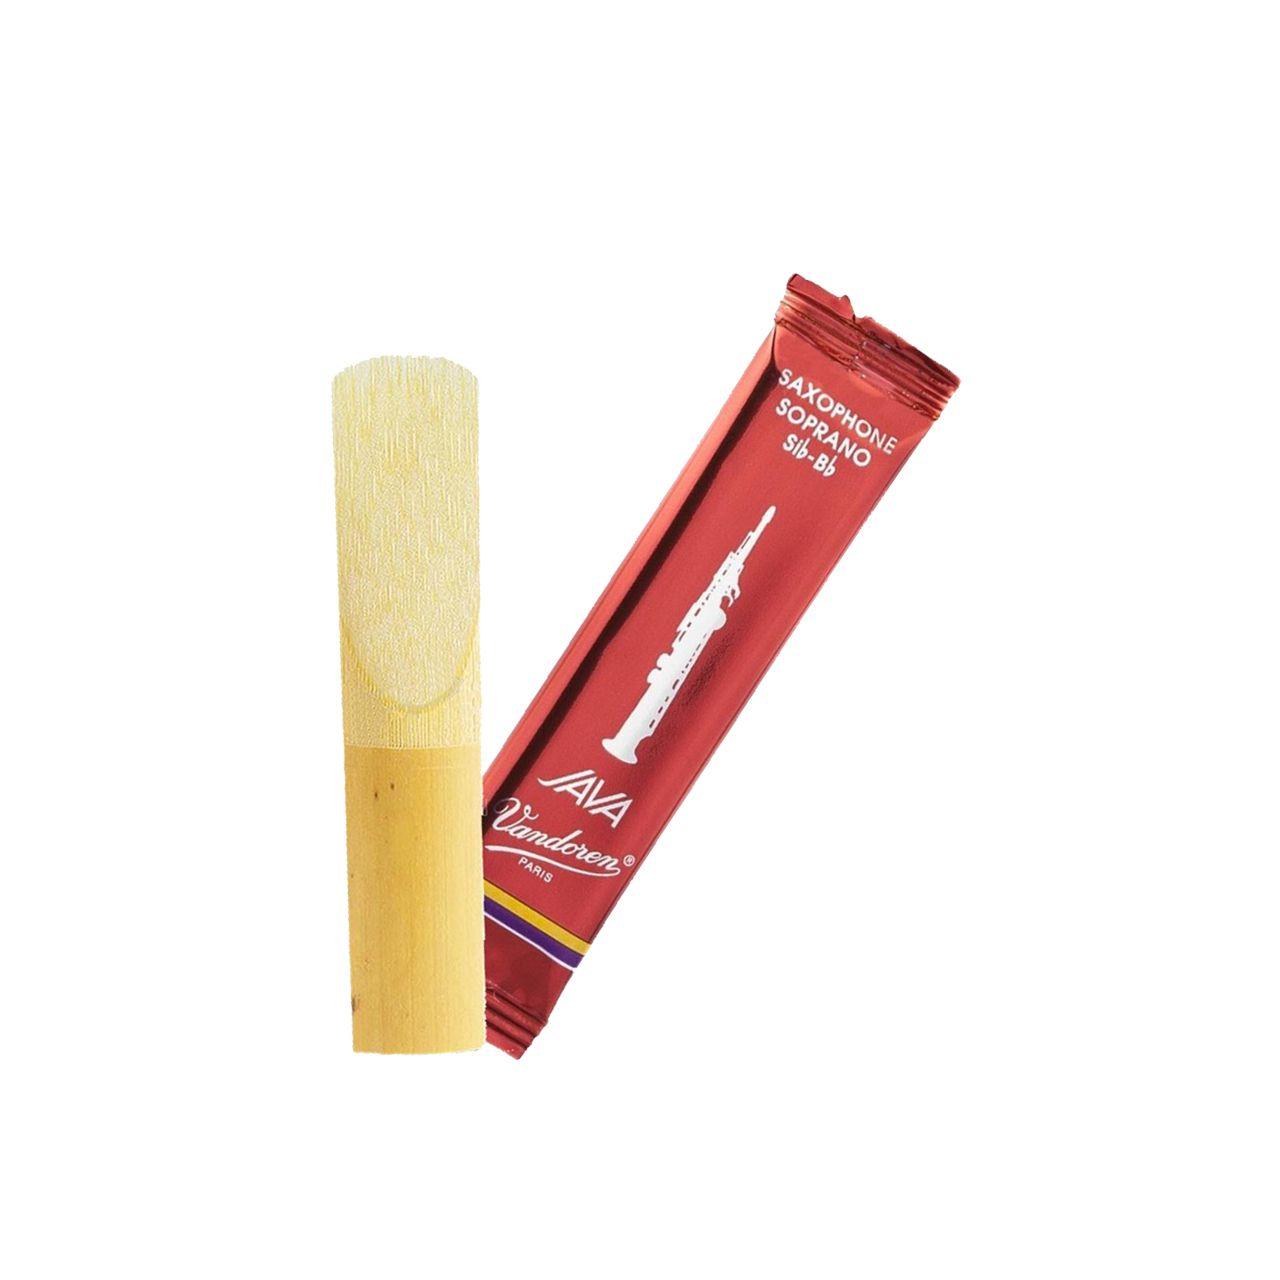 Palheta Java Red Cut 3,5 P/sax Soprano Cx C/10 Sr3035r Vandoren